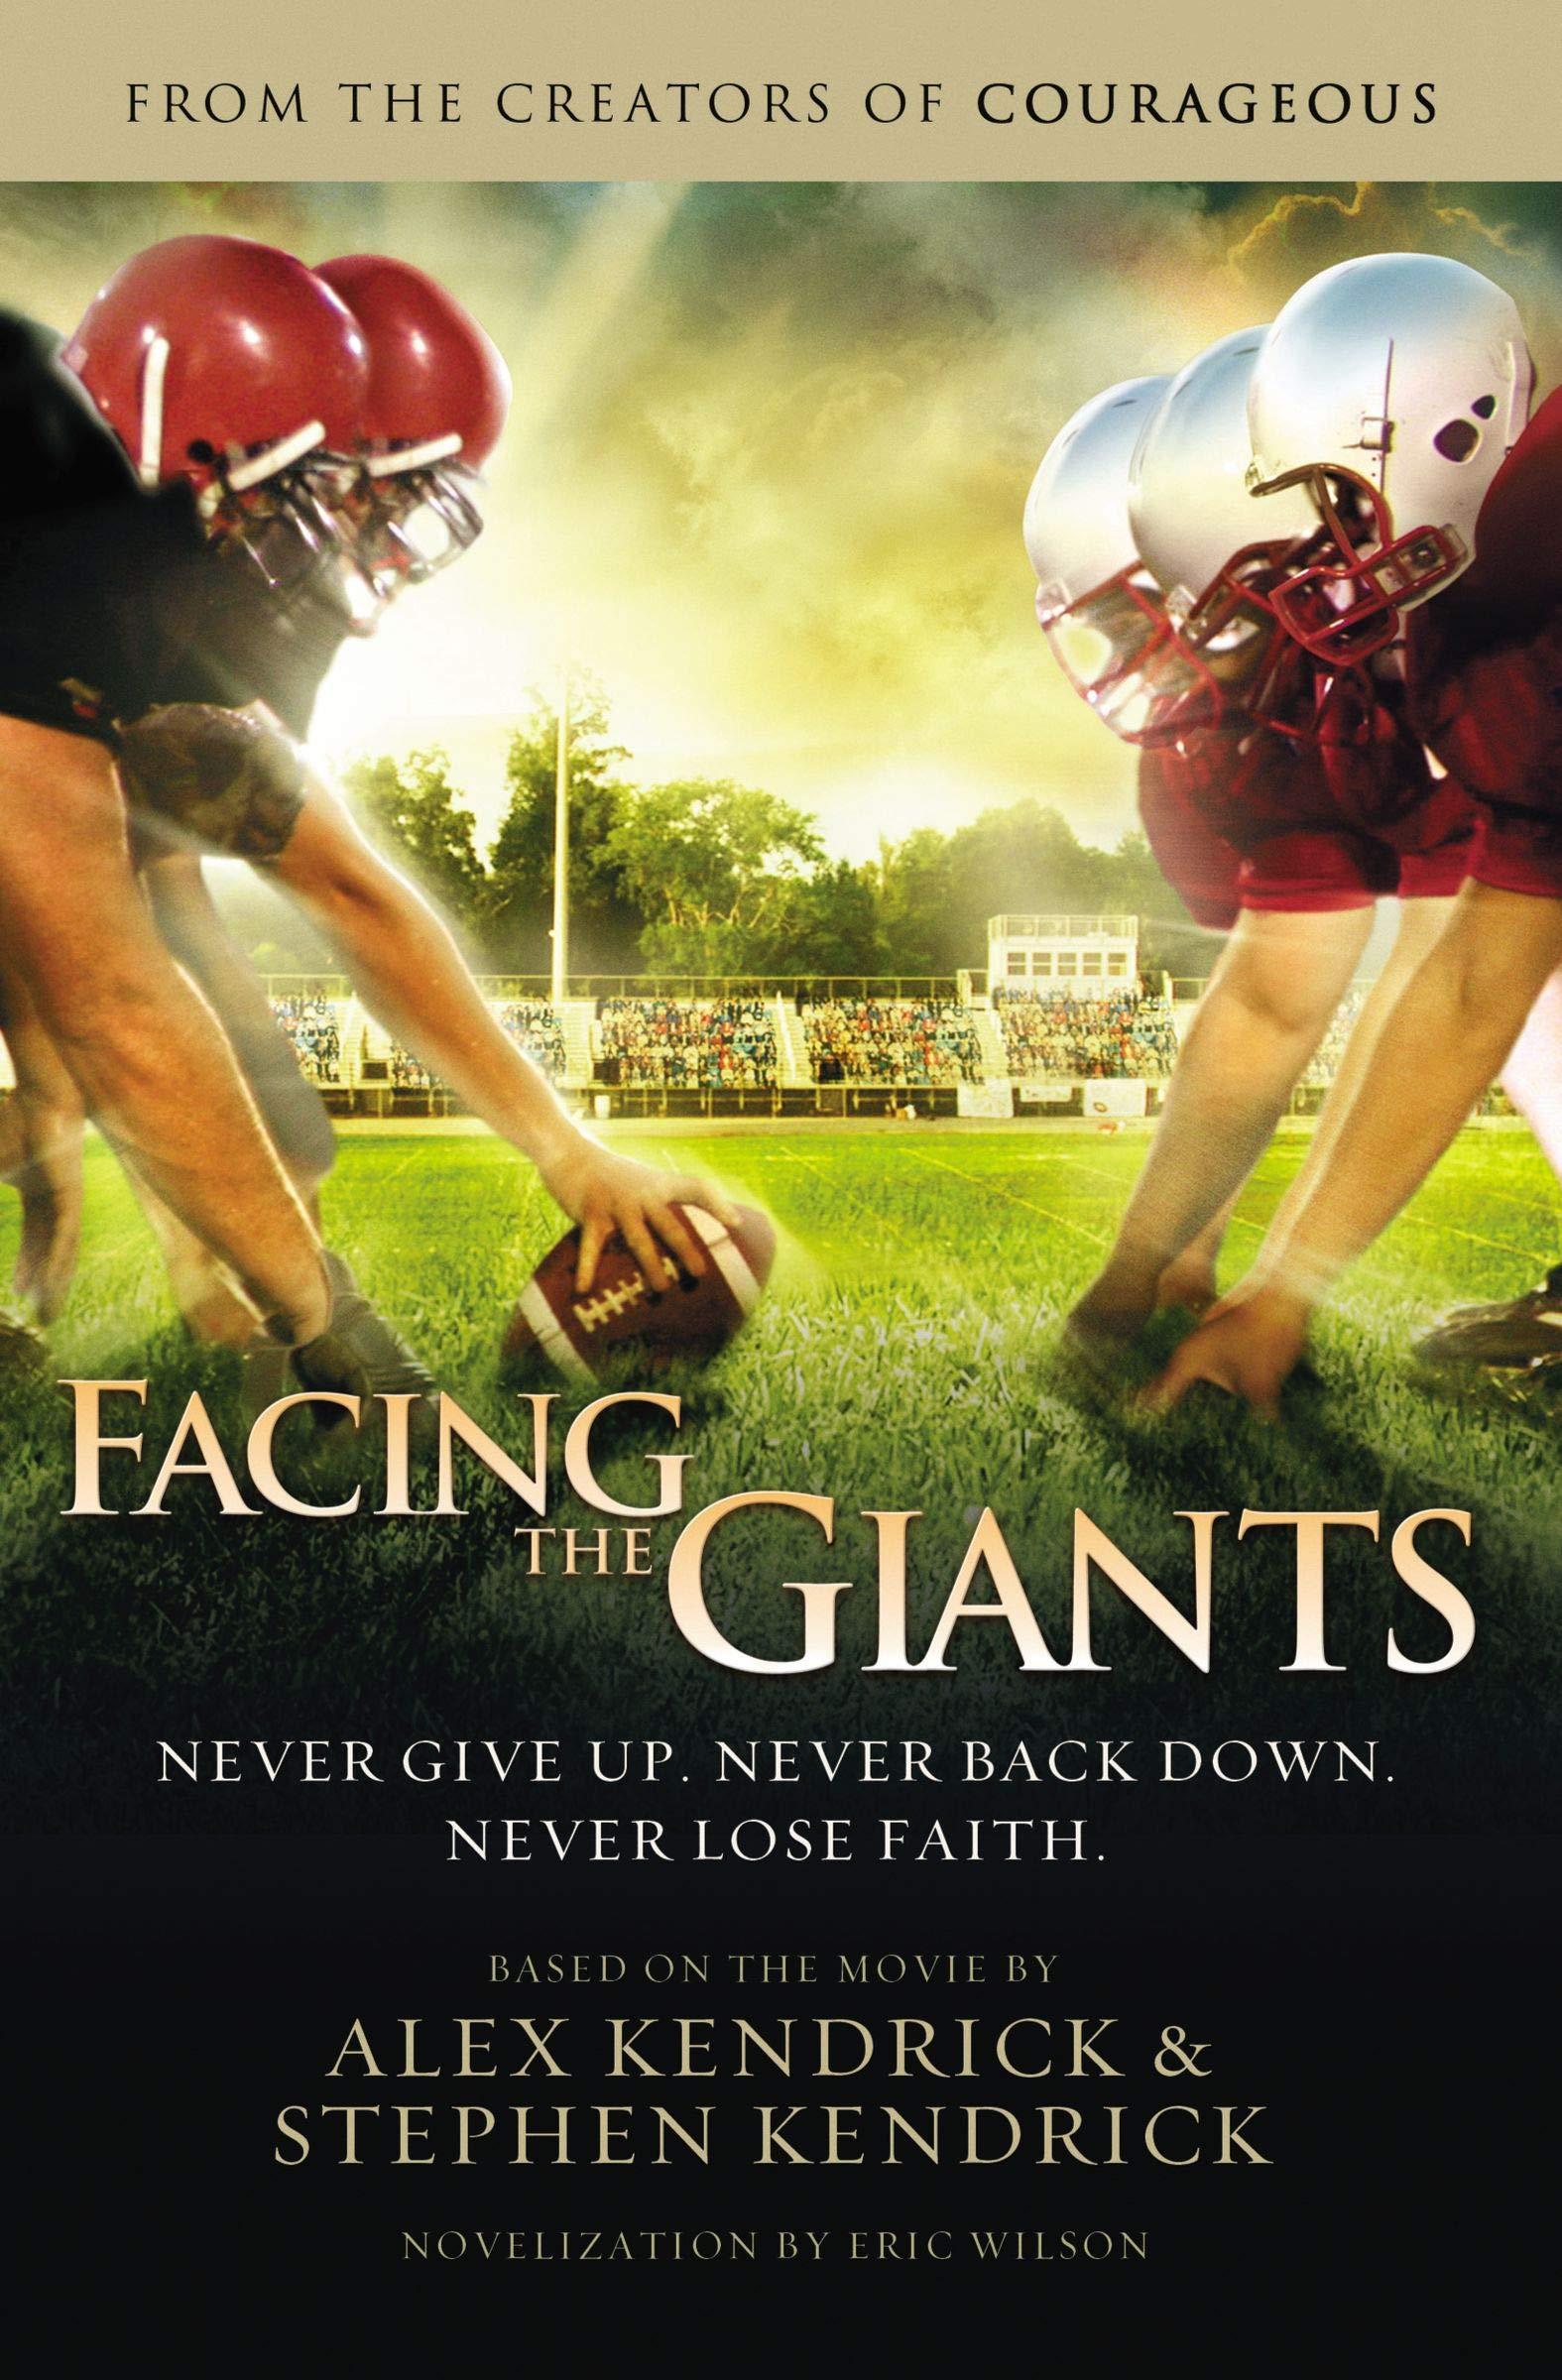 Facing the giants: Kendrick, Alex: 9781401685263: Amazon.com: Books